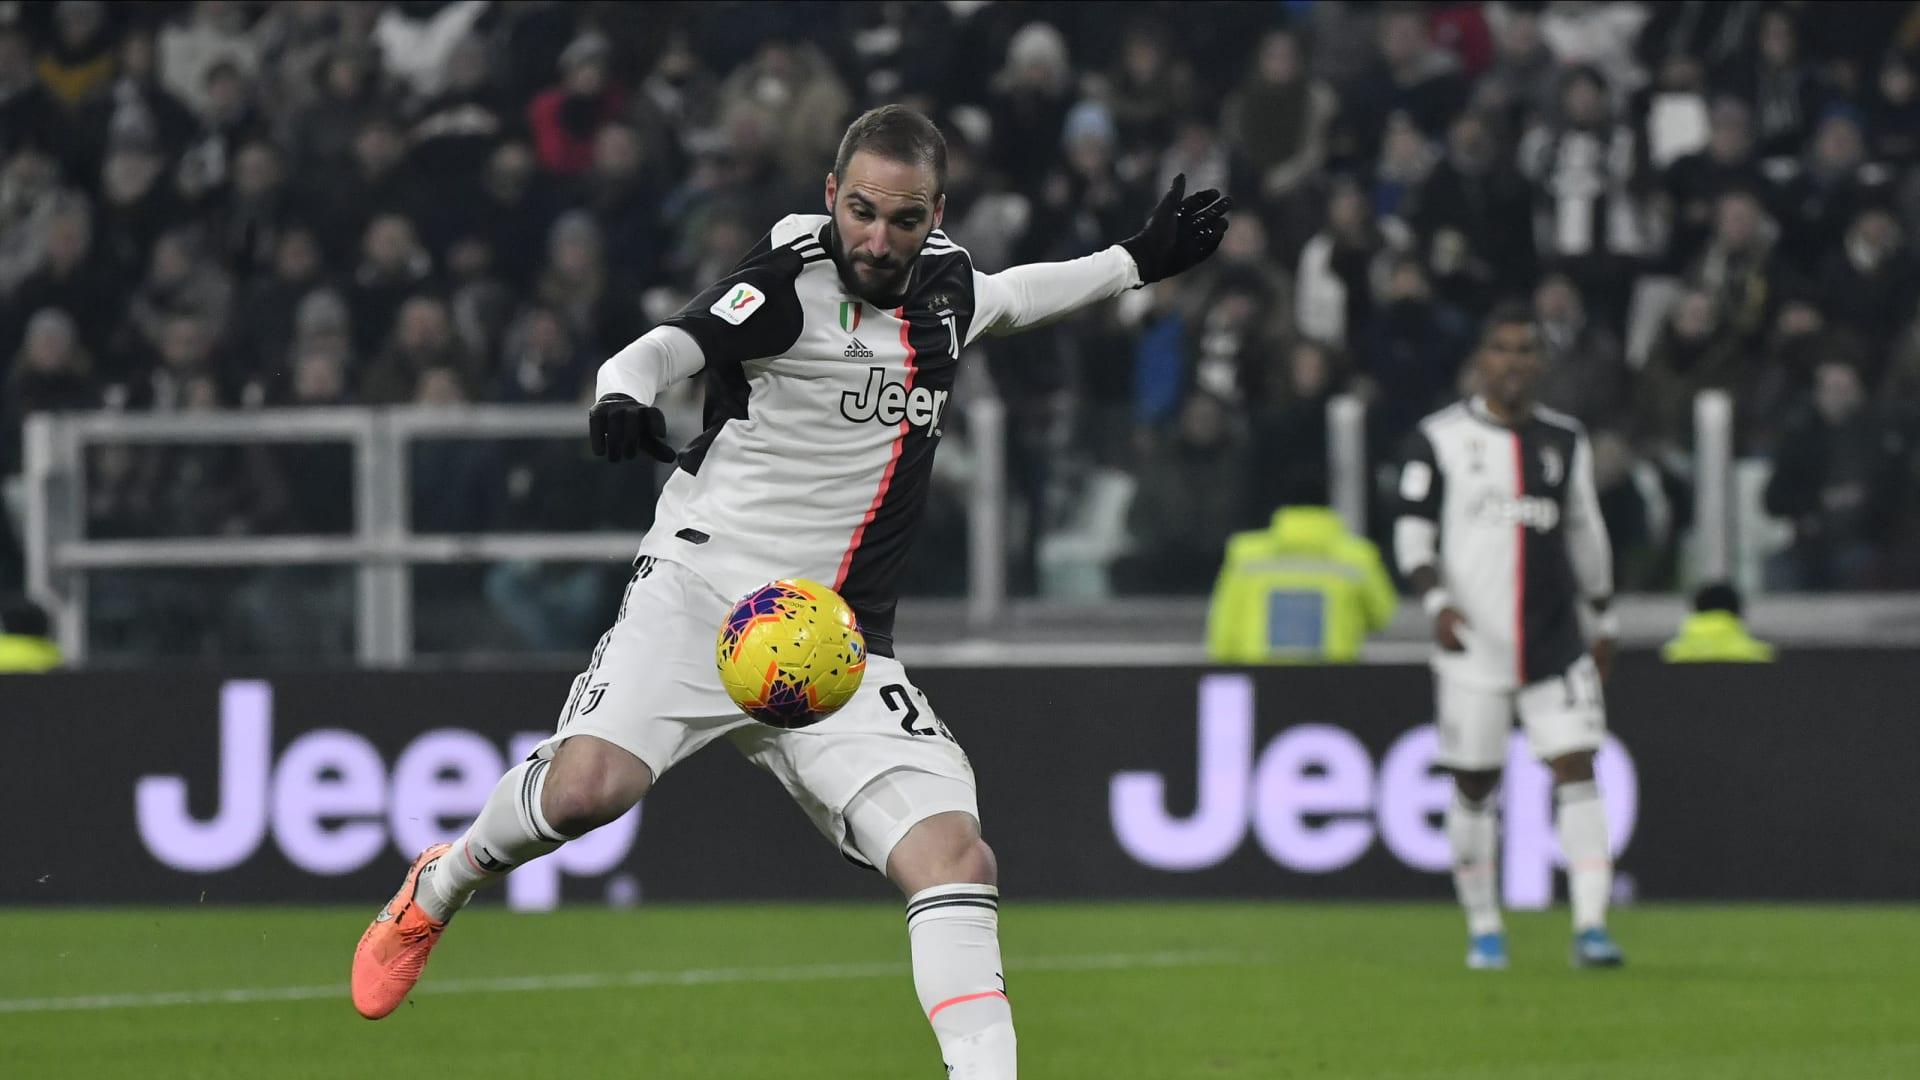 Juventus will miss Gonzalo Higuain against Milan next week